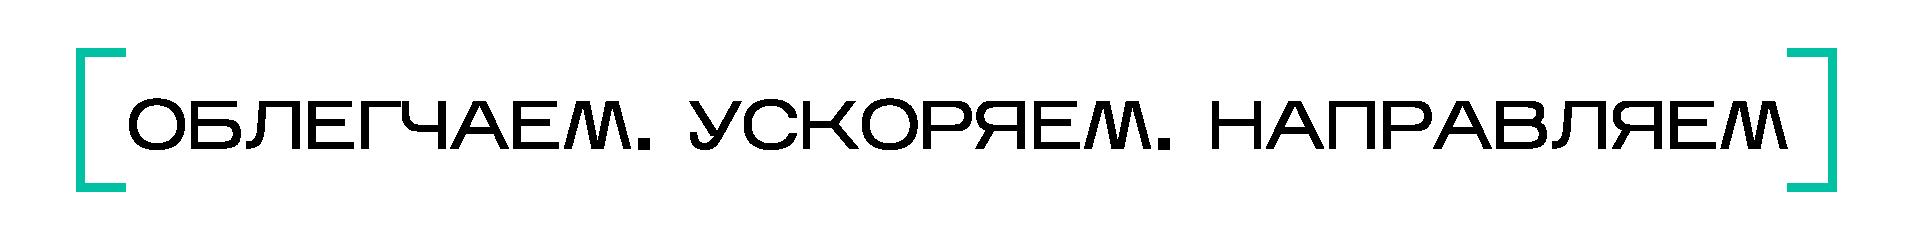 дескриптор (белый фон)